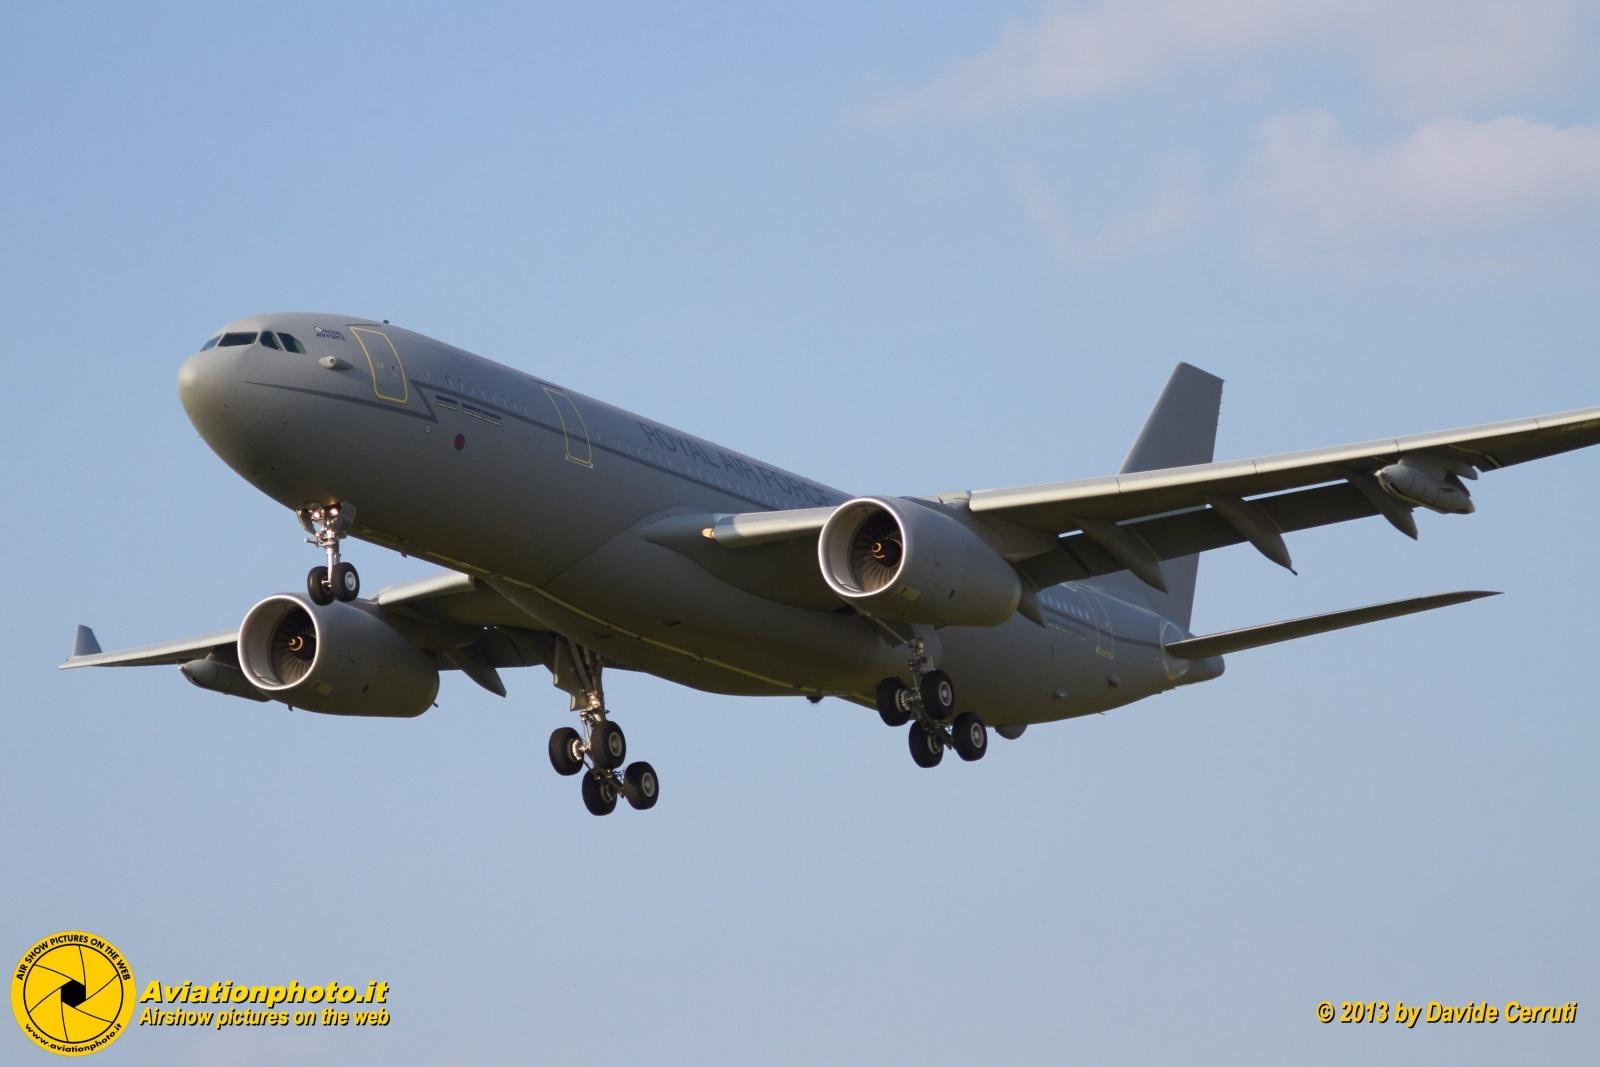 Royal International Air Tattoo 2013 - Thursday Arrival